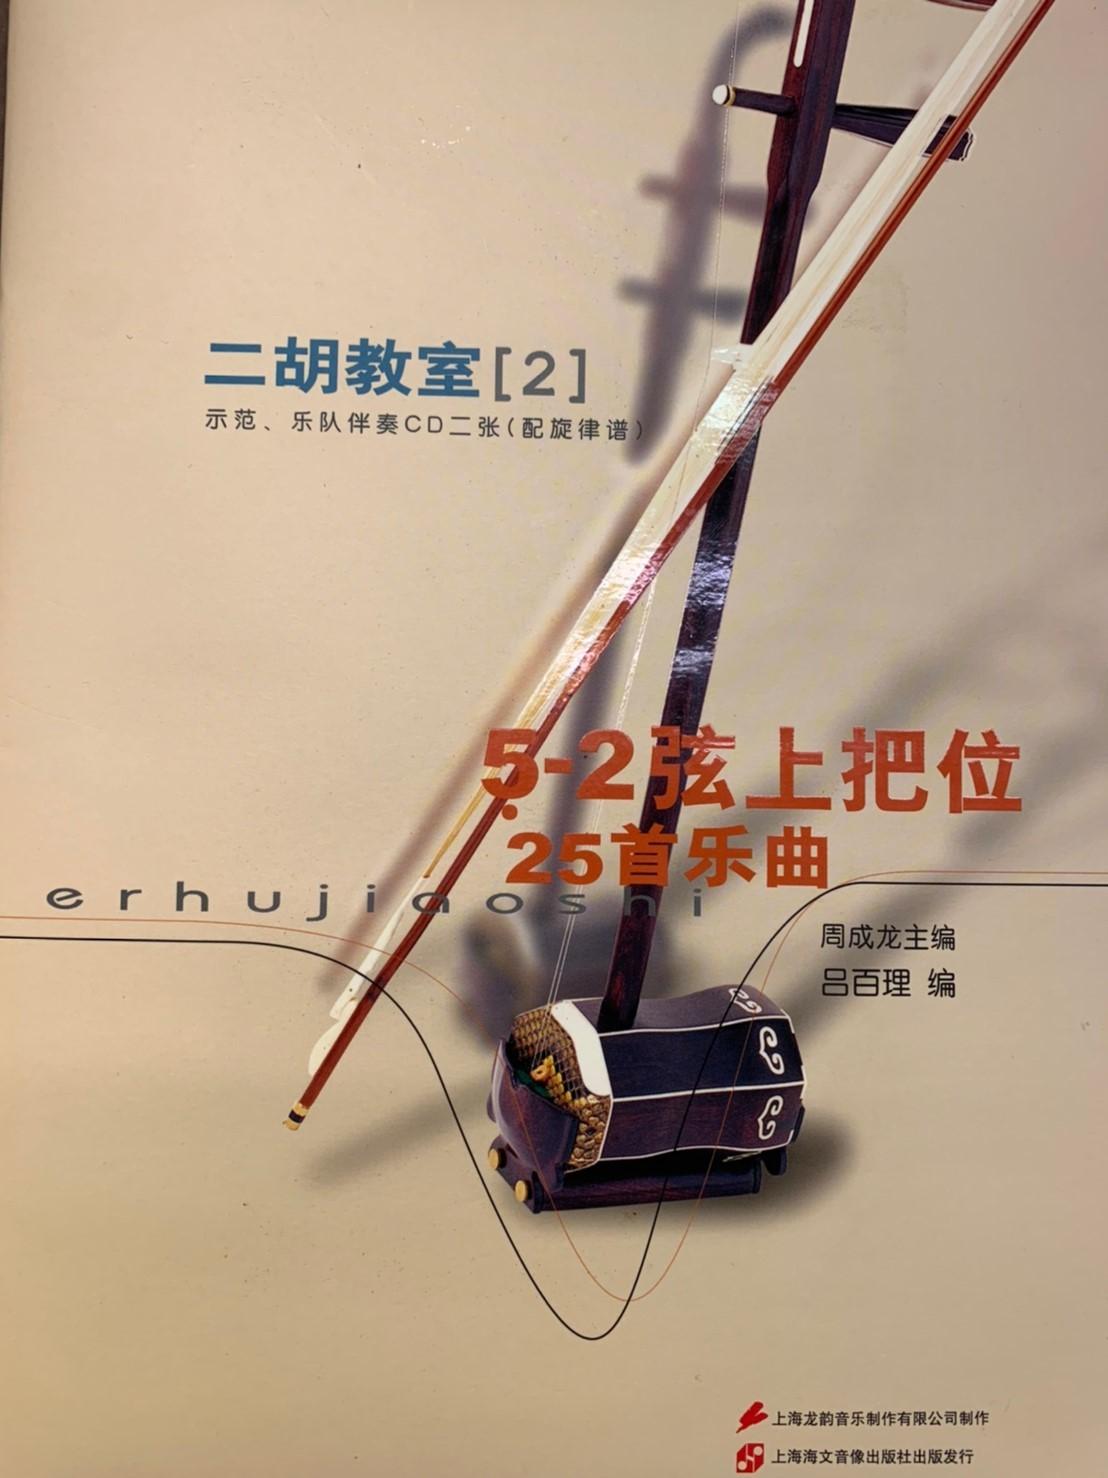 E64D3B7D-E733-4BB3-BCDF-523B88614D68.jpeg